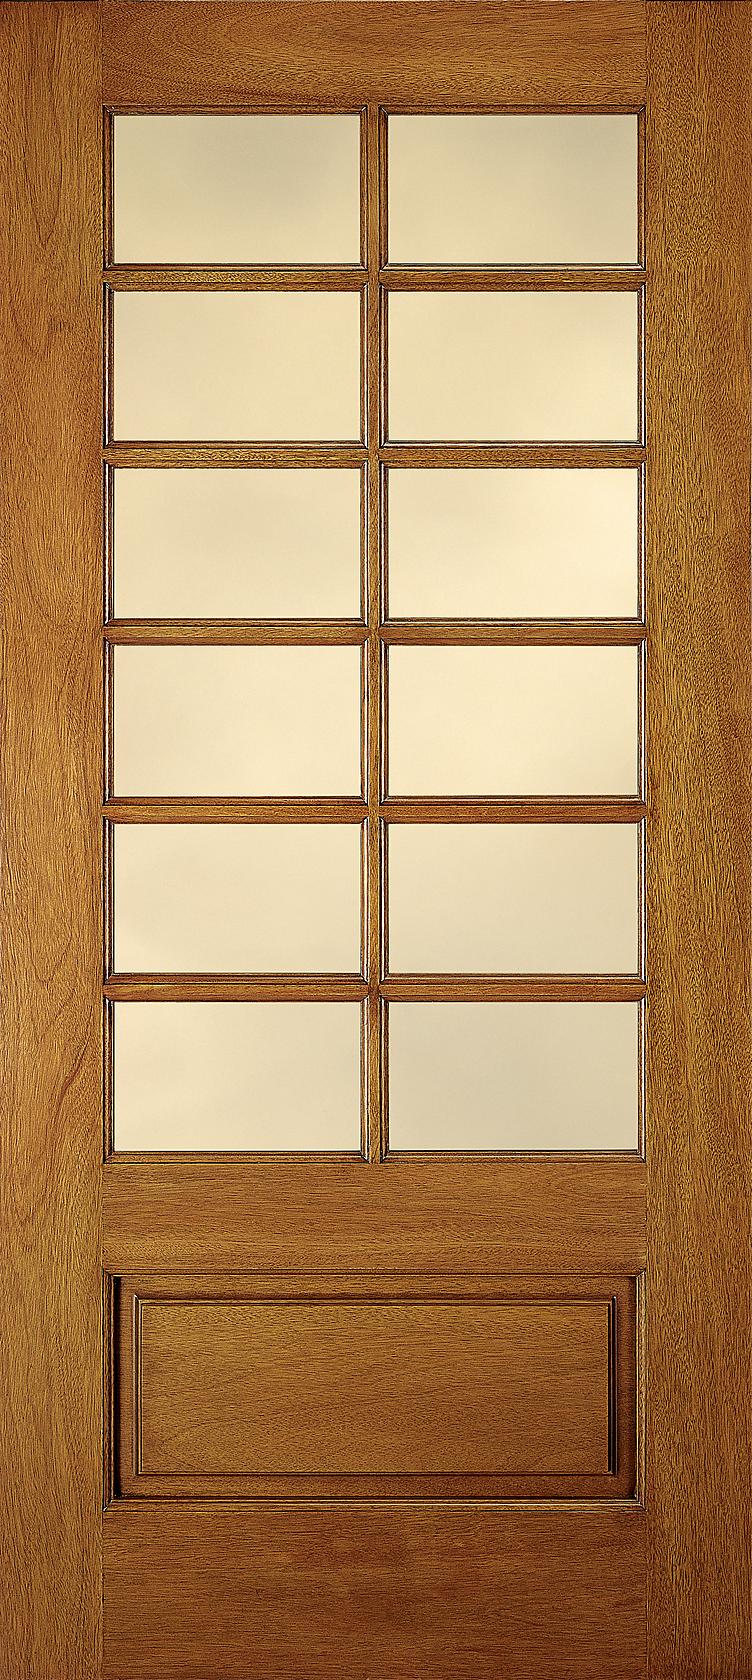 Interior doors with glass panel - Interior Doors With Glass Panel 27